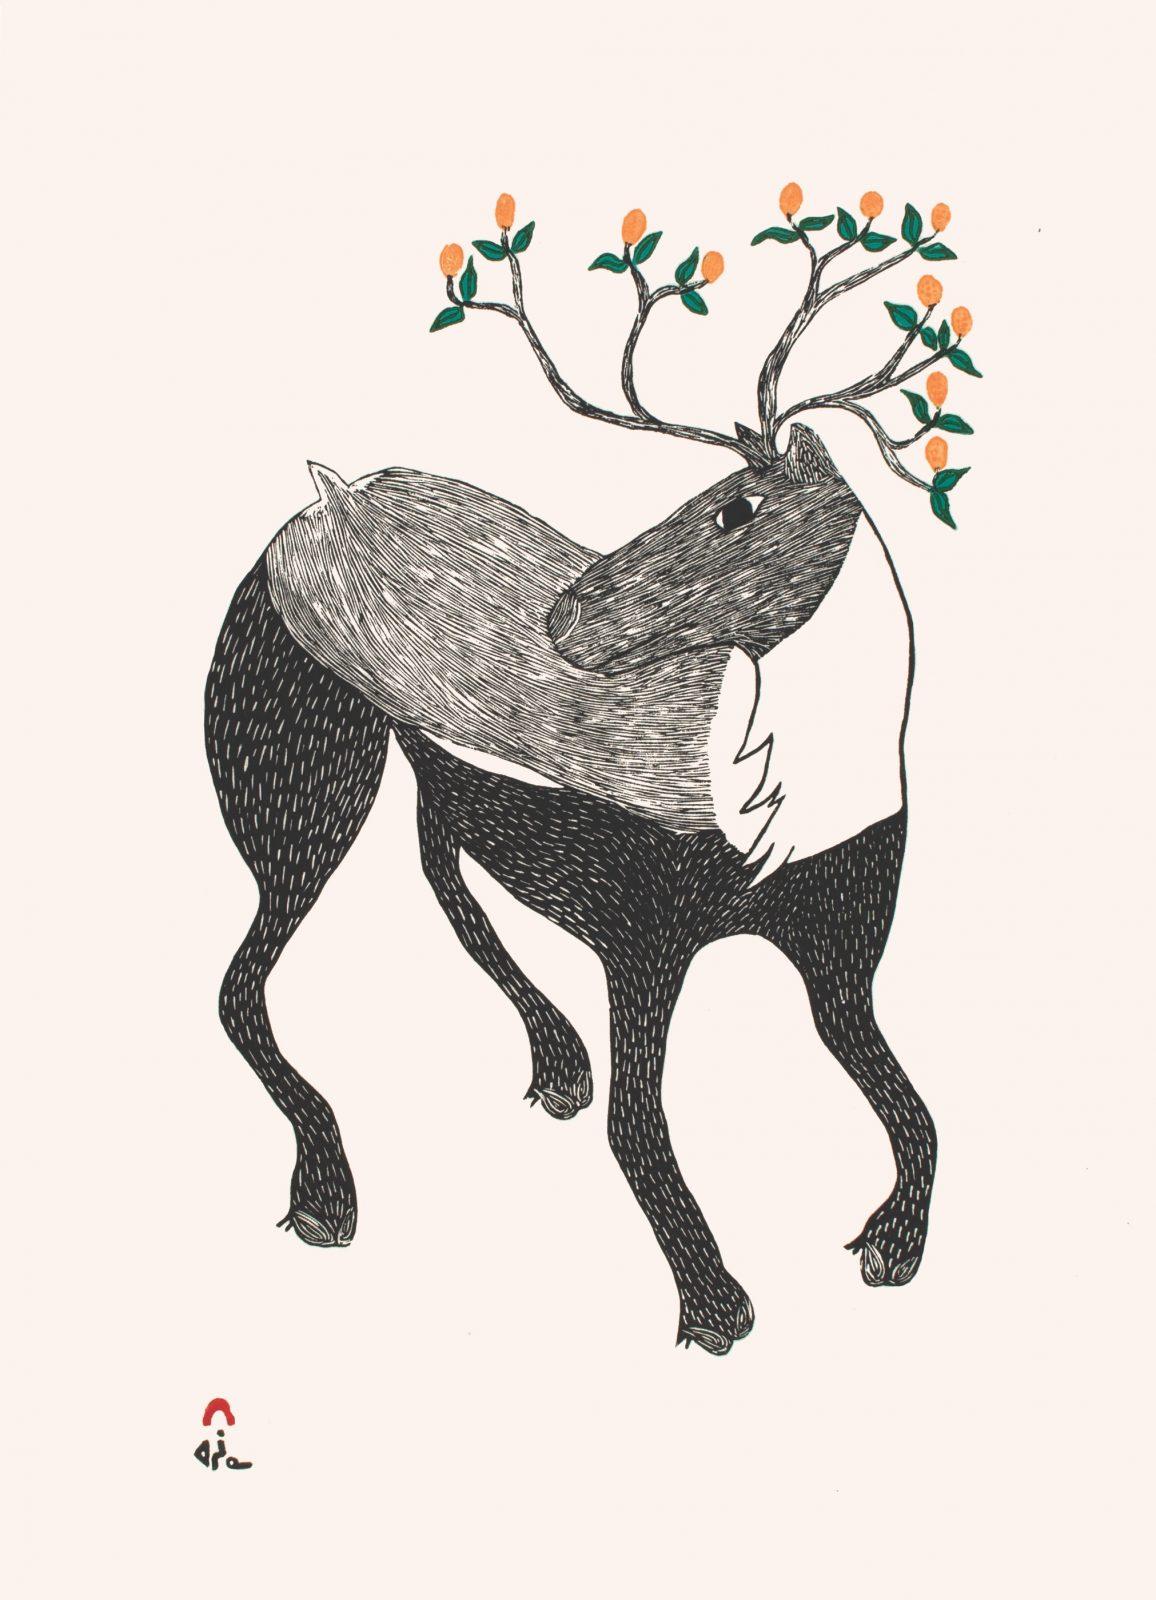 NINGIUKULU TEEVEE Caribou in Bloom Cape Dorset Print 2021